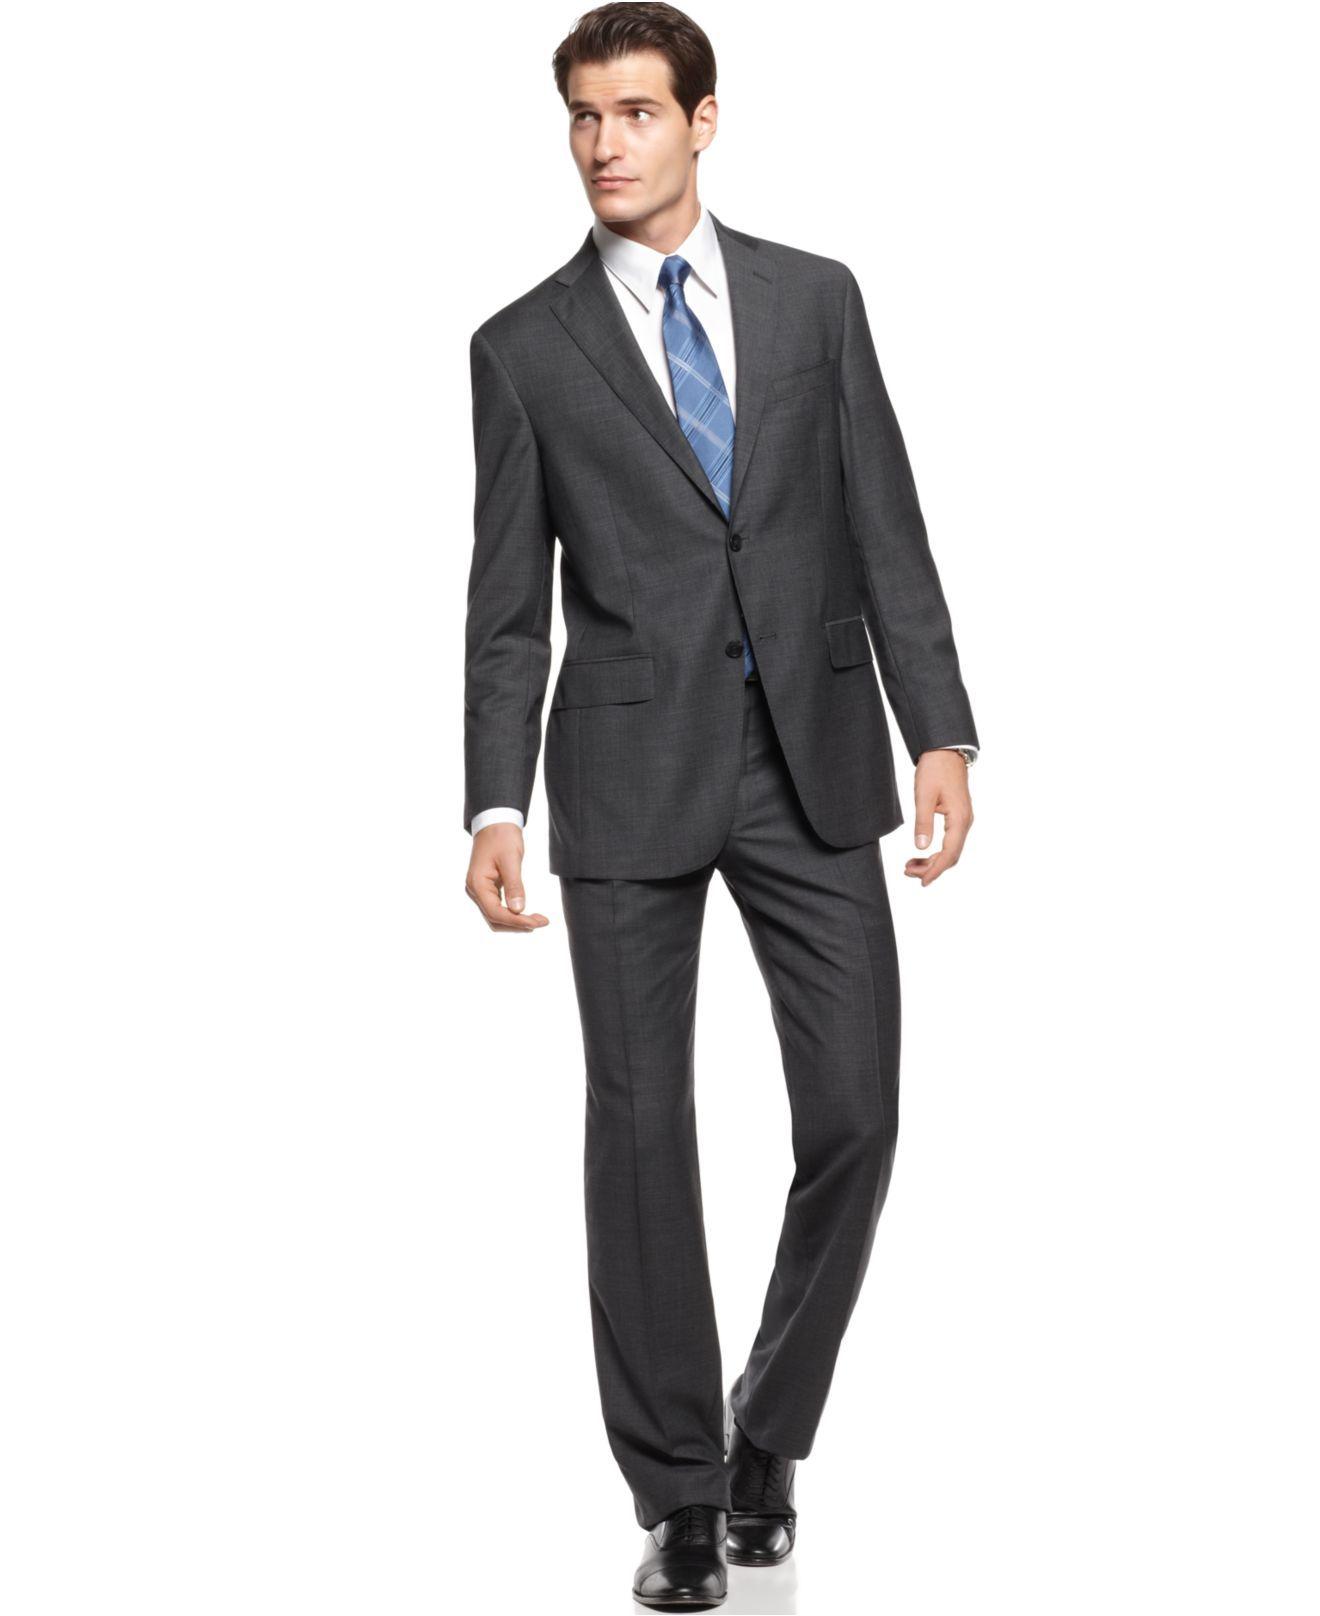 Hart Shaffner & Marx Suit, Charcoal Mini Check Modern Fit - Mens ...